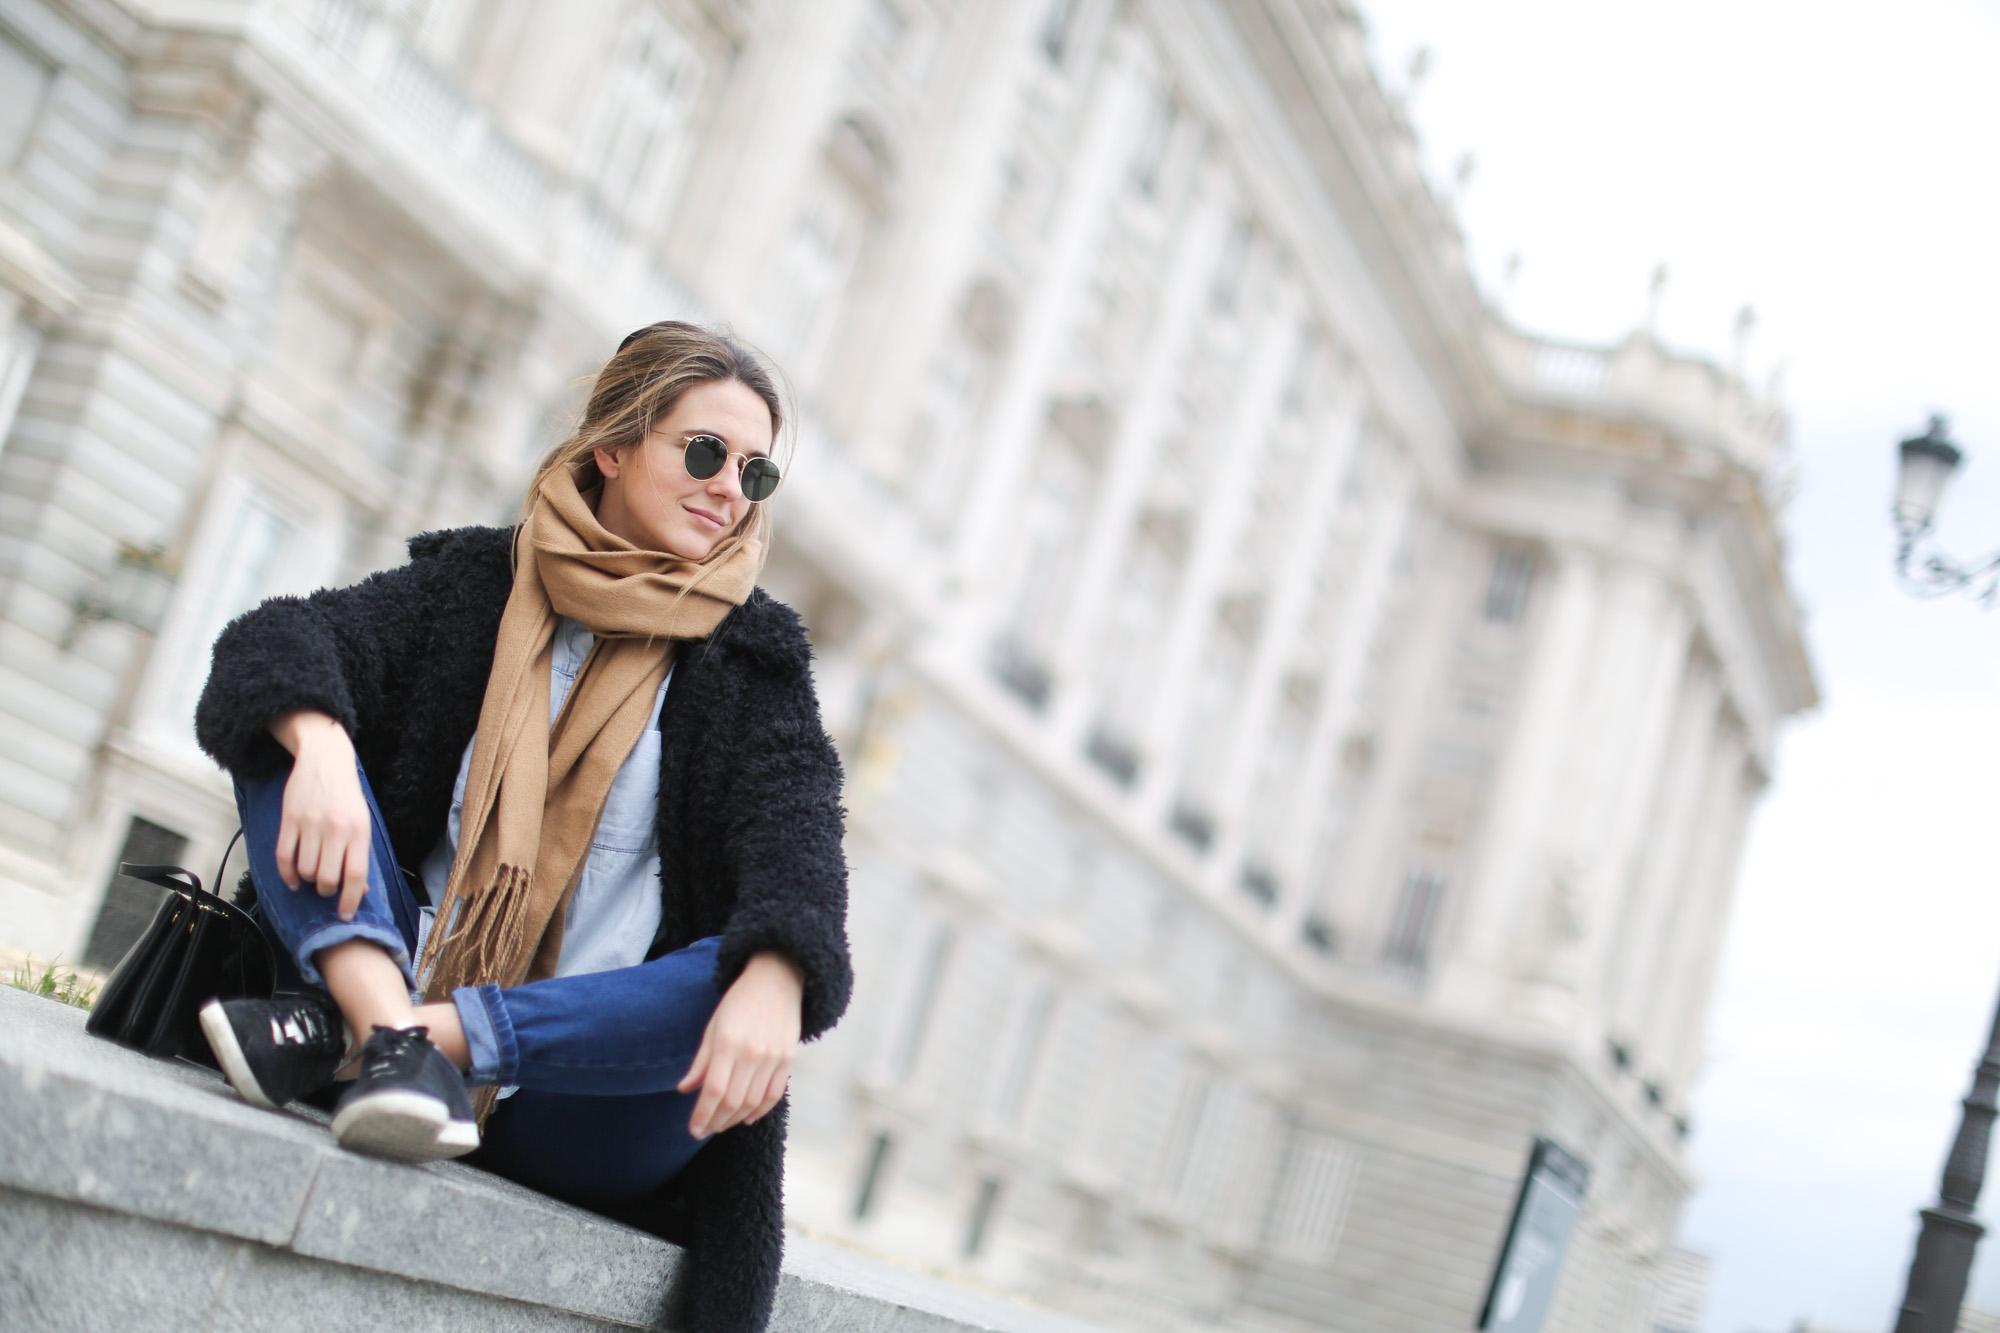 Clochet-mango-flurry-coat-mum-jeans-adidas-gazelle-13